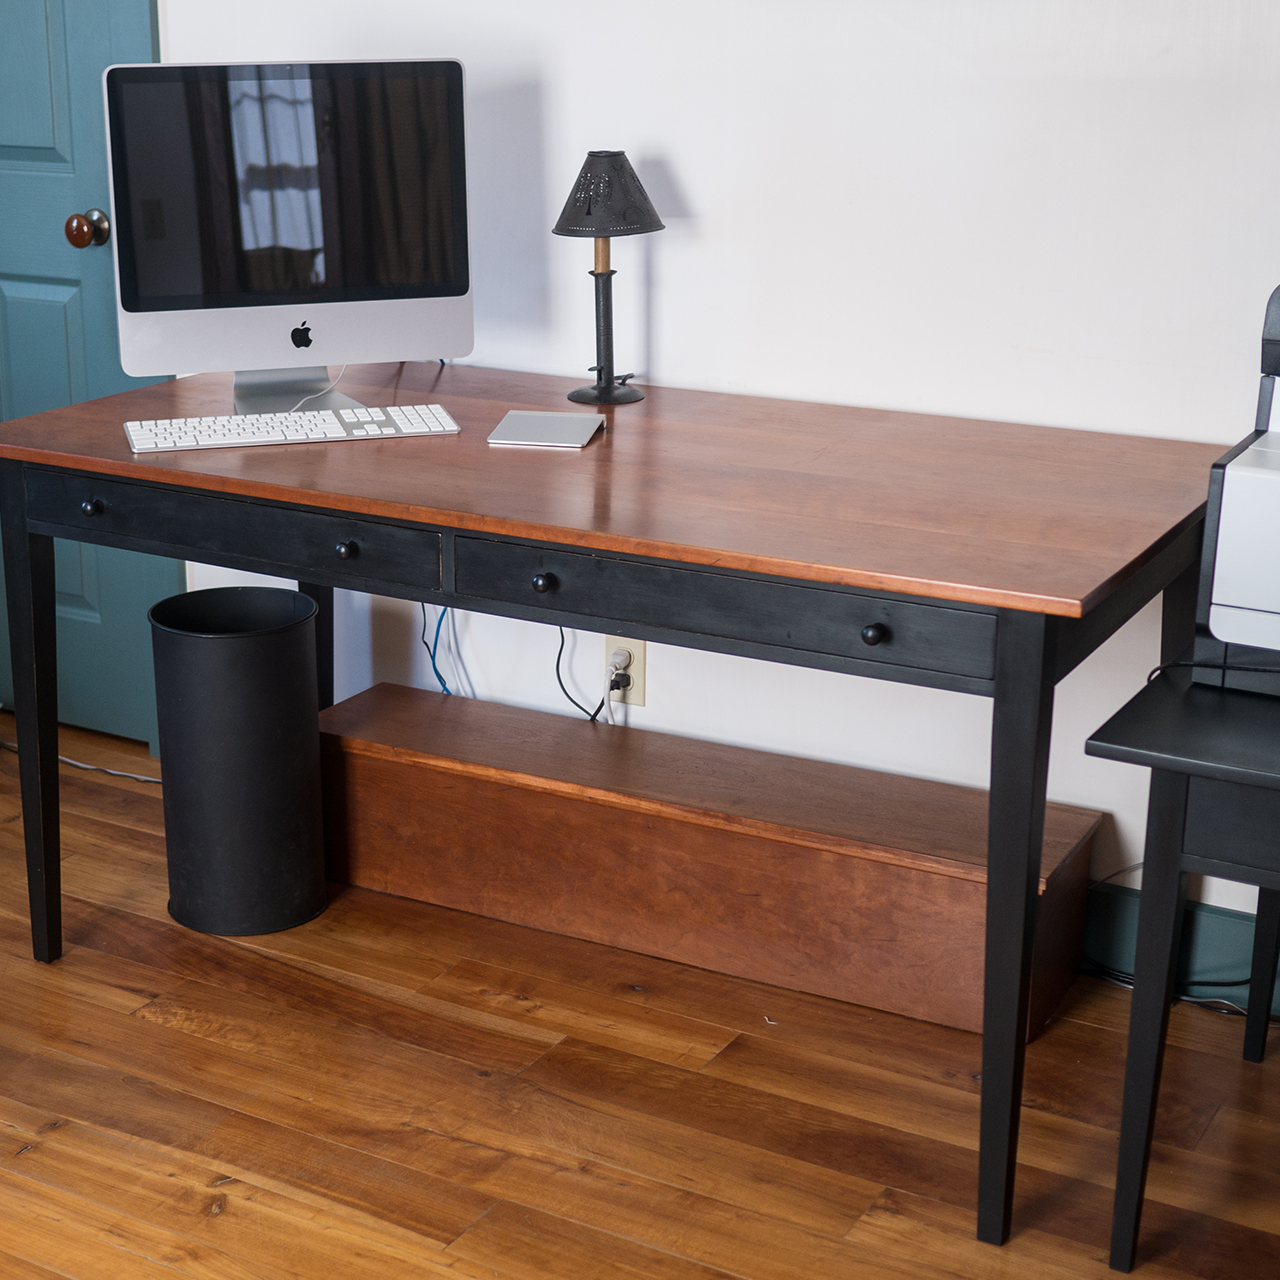 Shaker Two Drawer Desk/Table